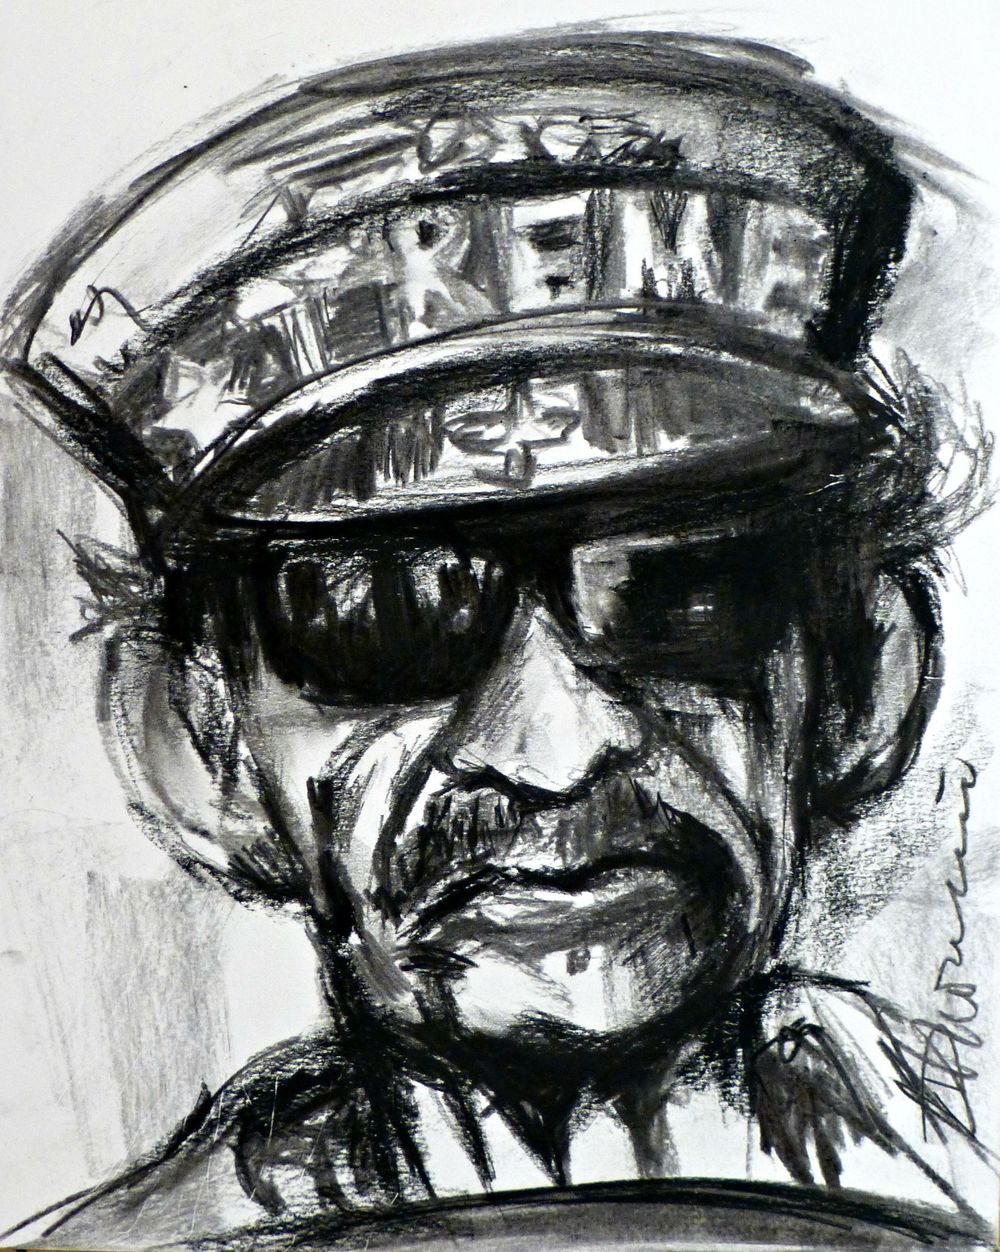 Uncle Lionel sketch-2015.jpg